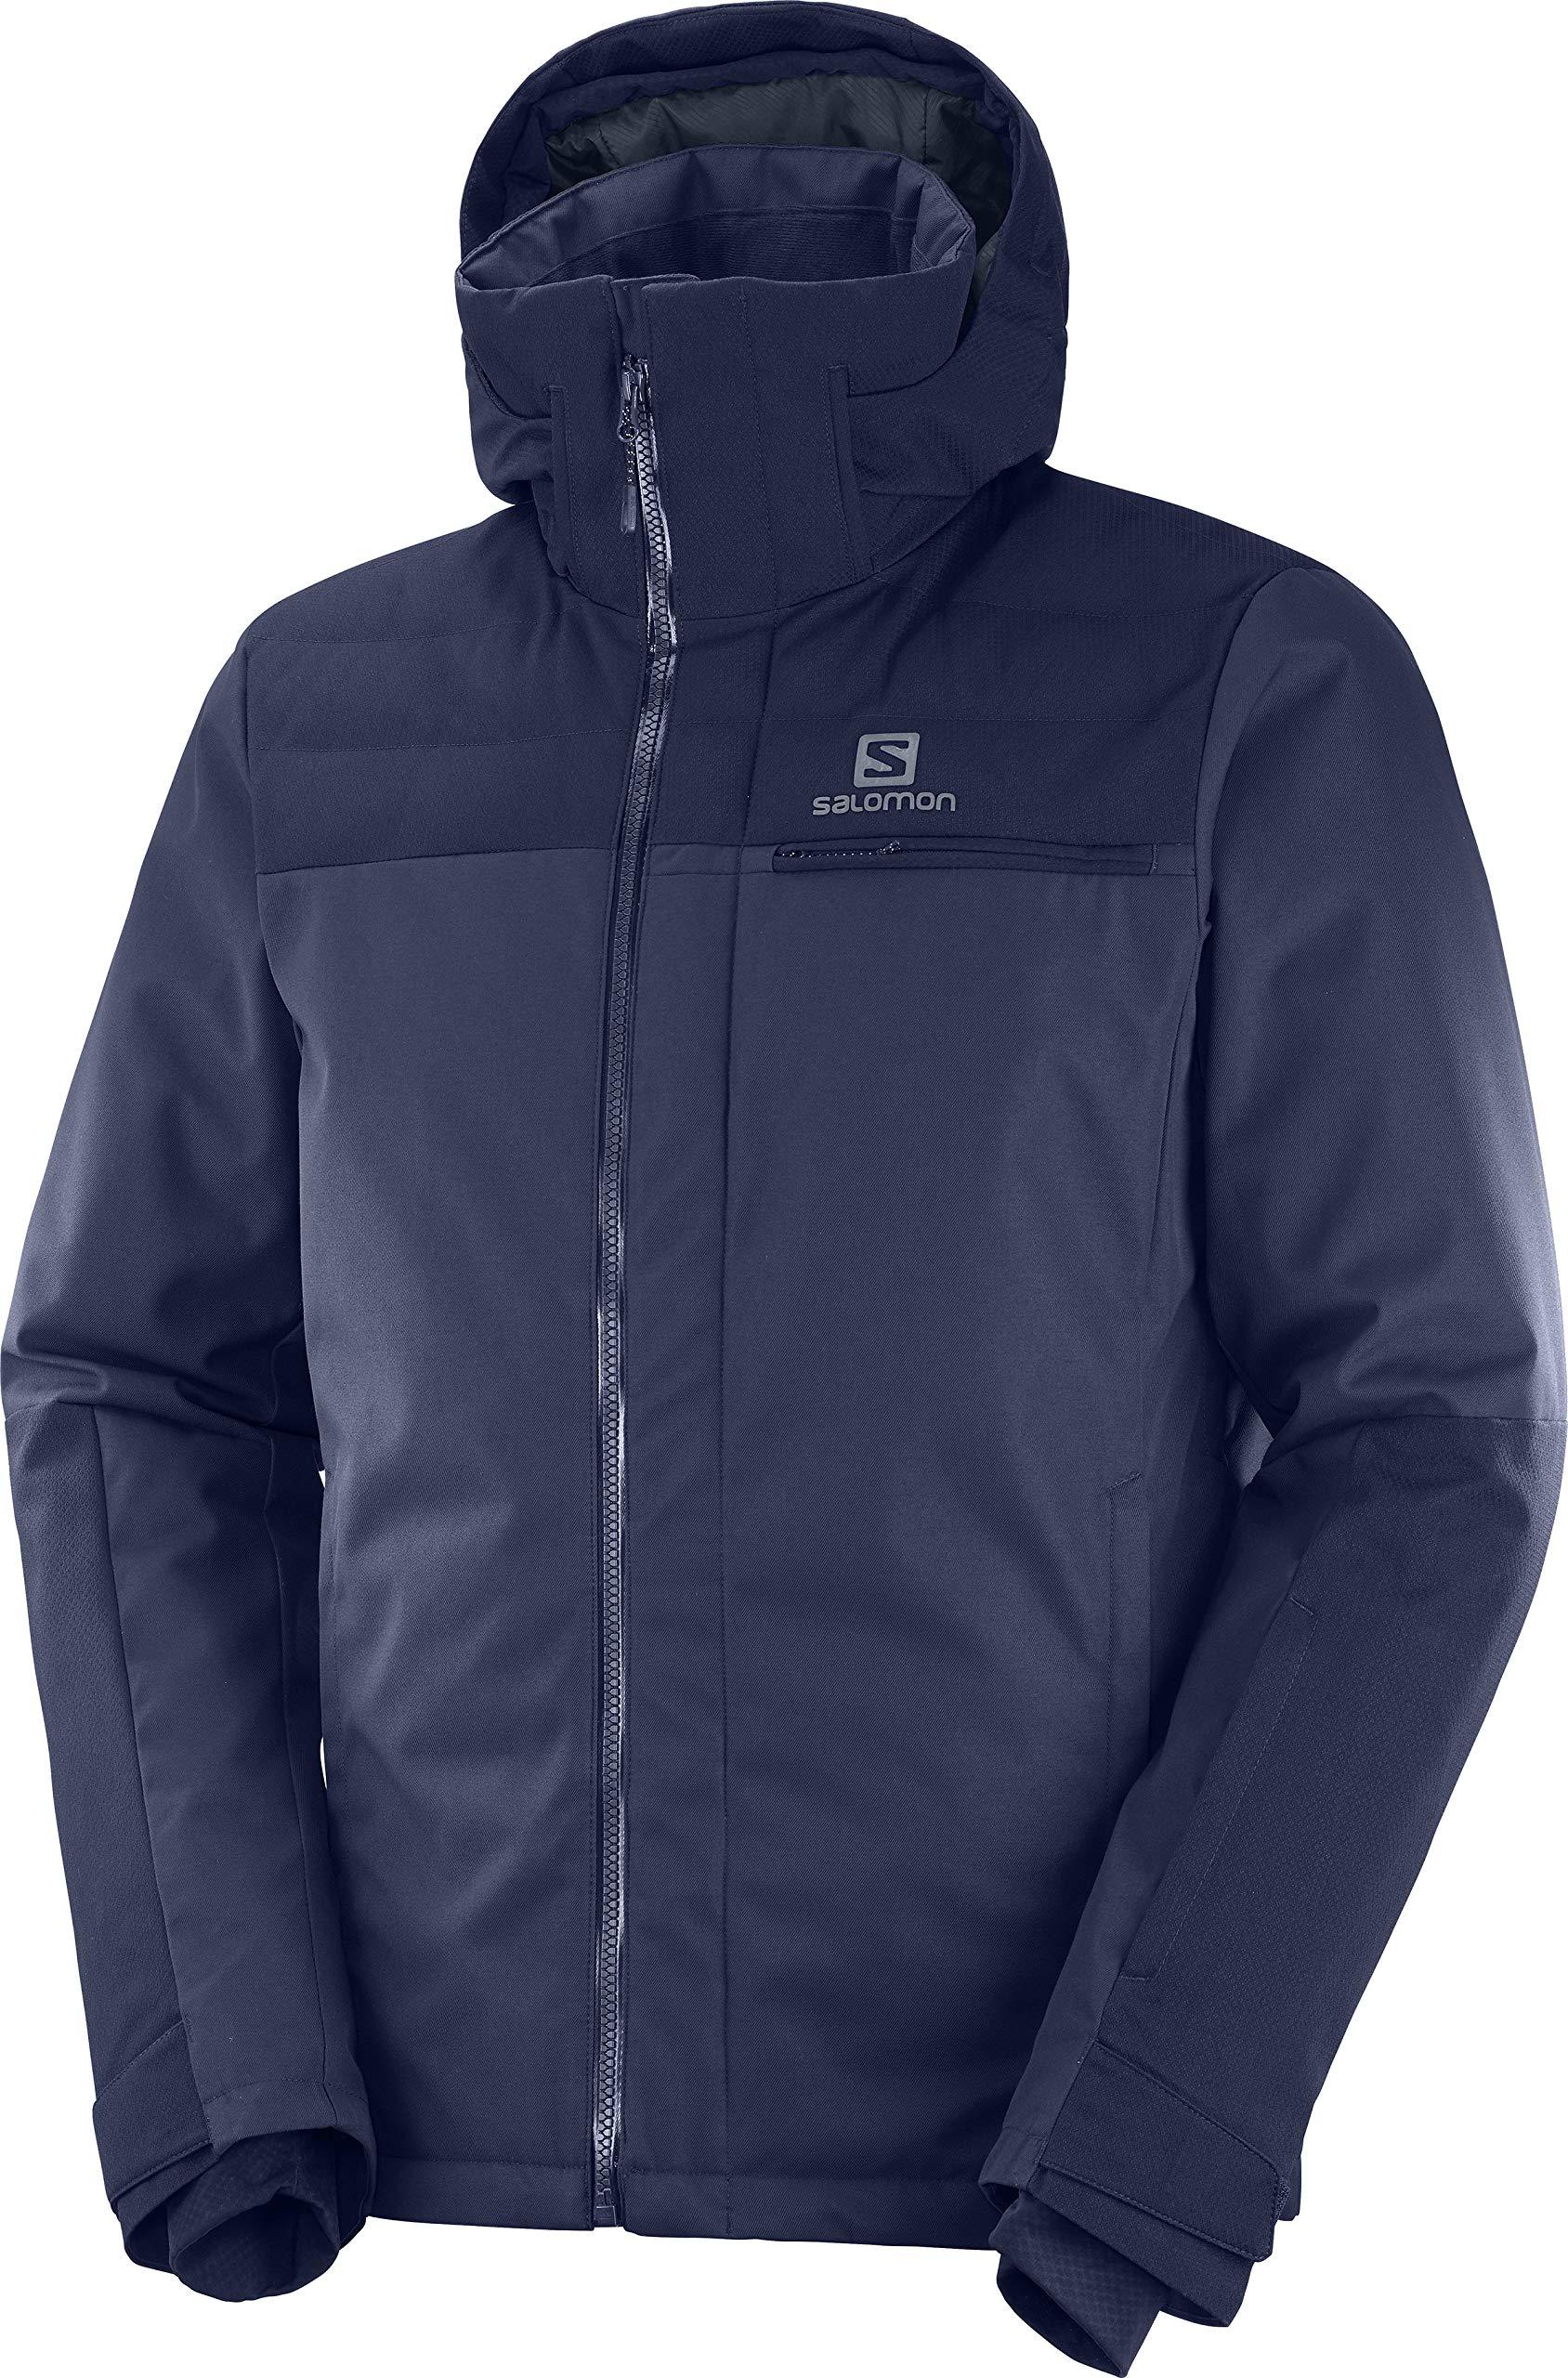 Salomon Men's Stormbraver Jacket